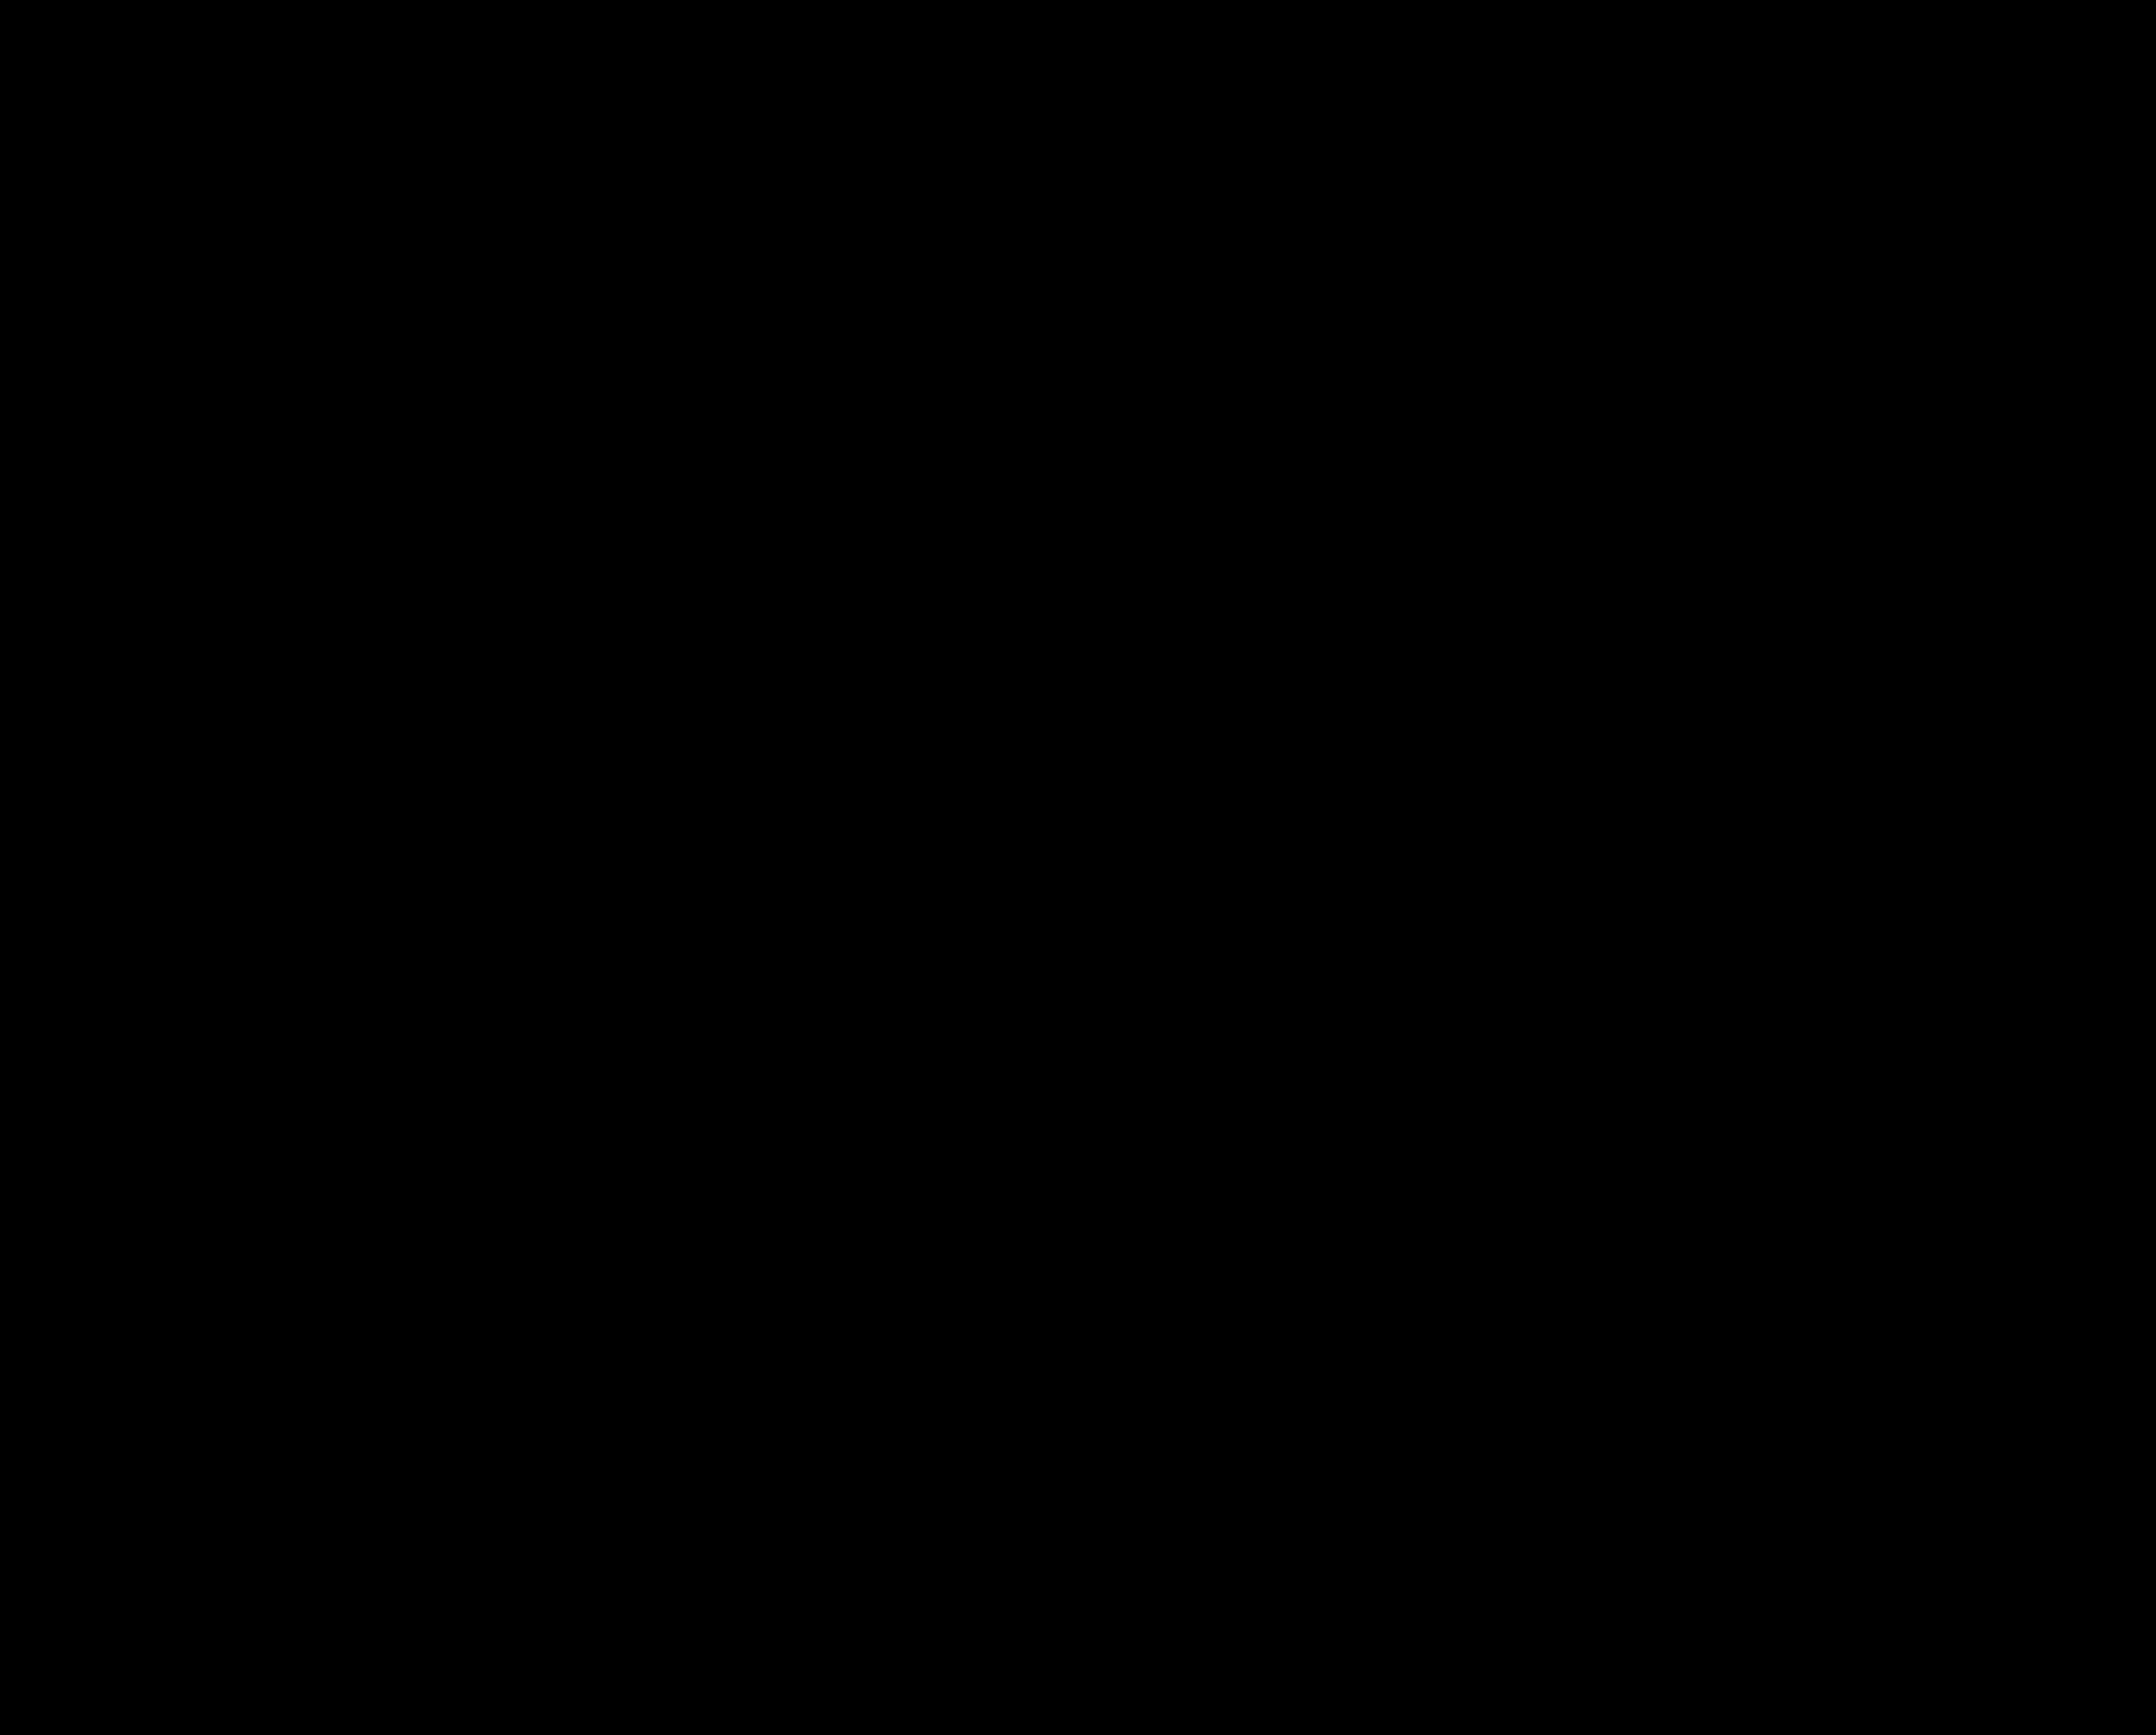 Sunyata-finals-BW_black-icon-name.png